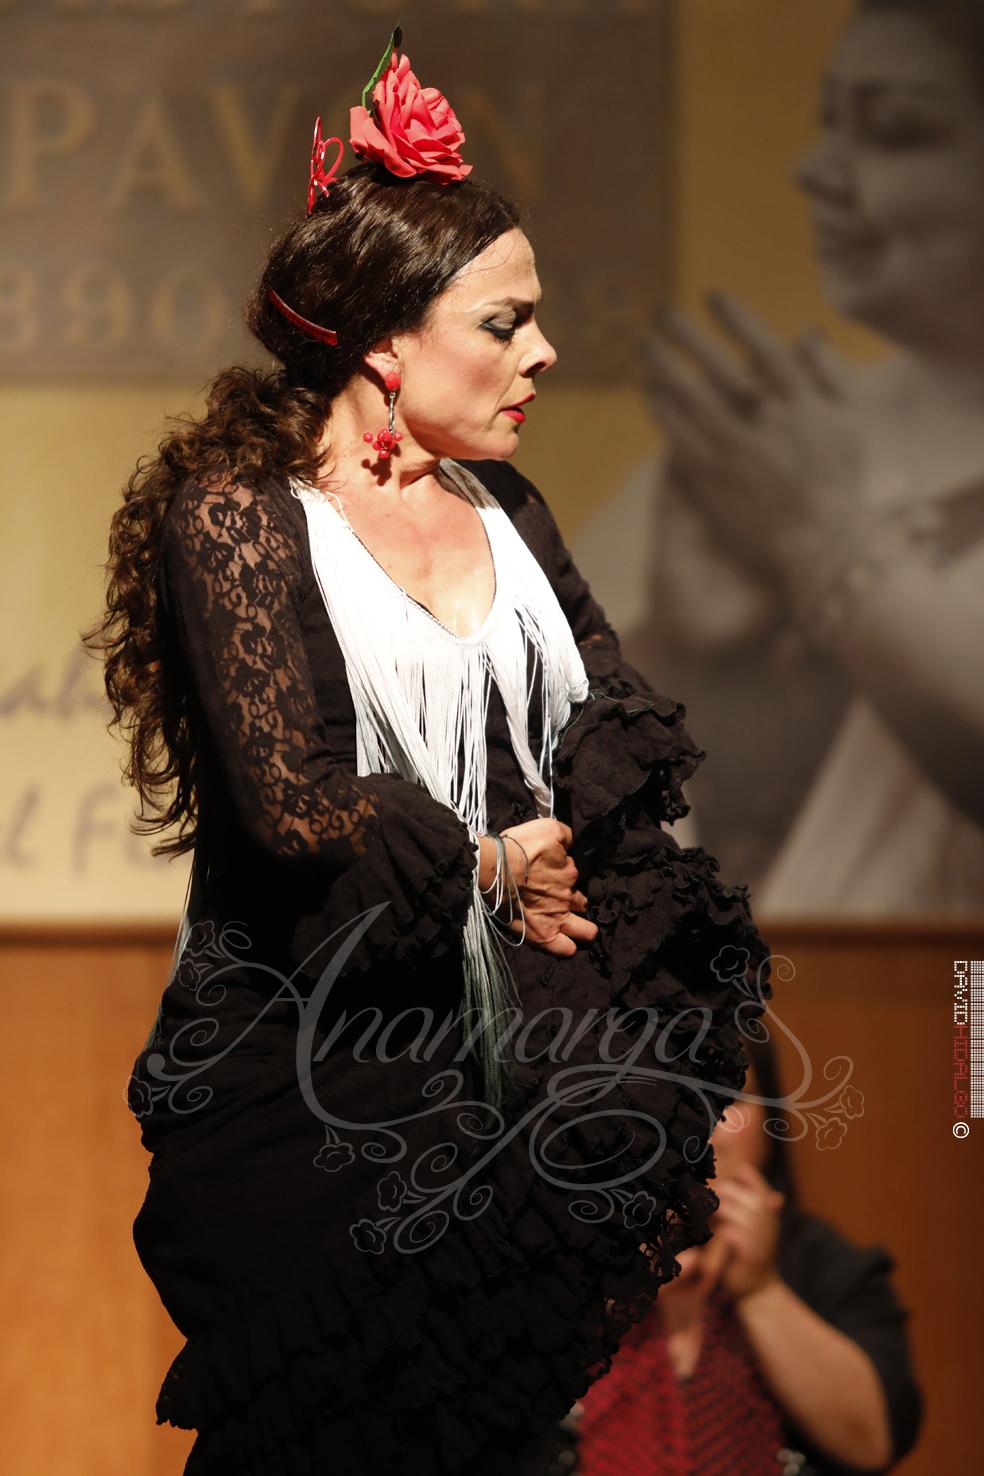 Anamarga_flamenco_peñaNiñaPeines_22